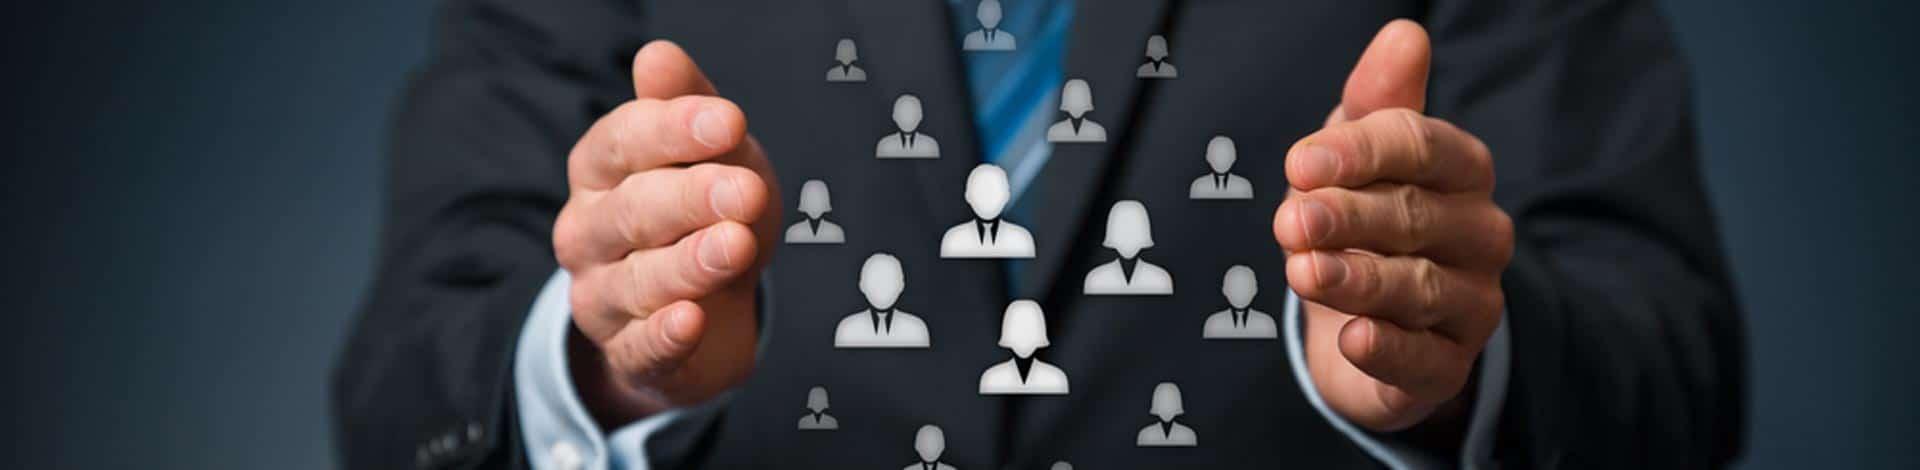 Christofer Group of Companies - Career